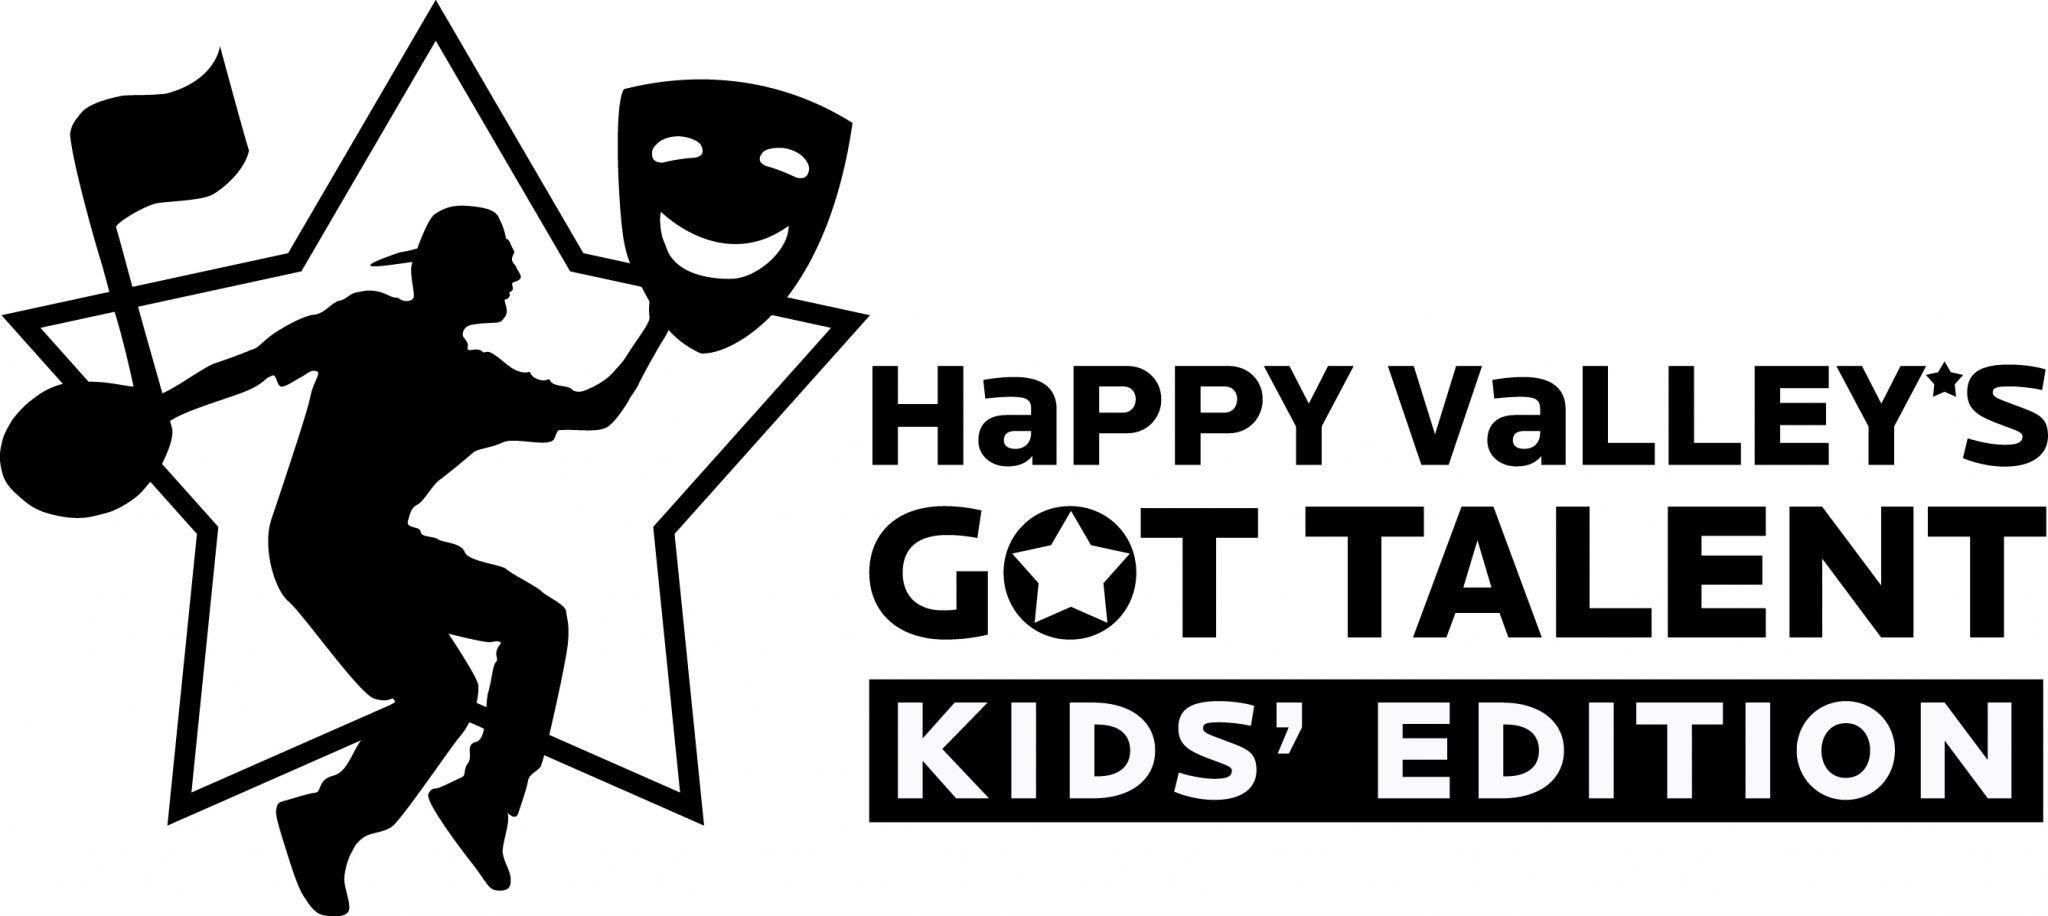 Happy Valley's Got Talent (HVGT)